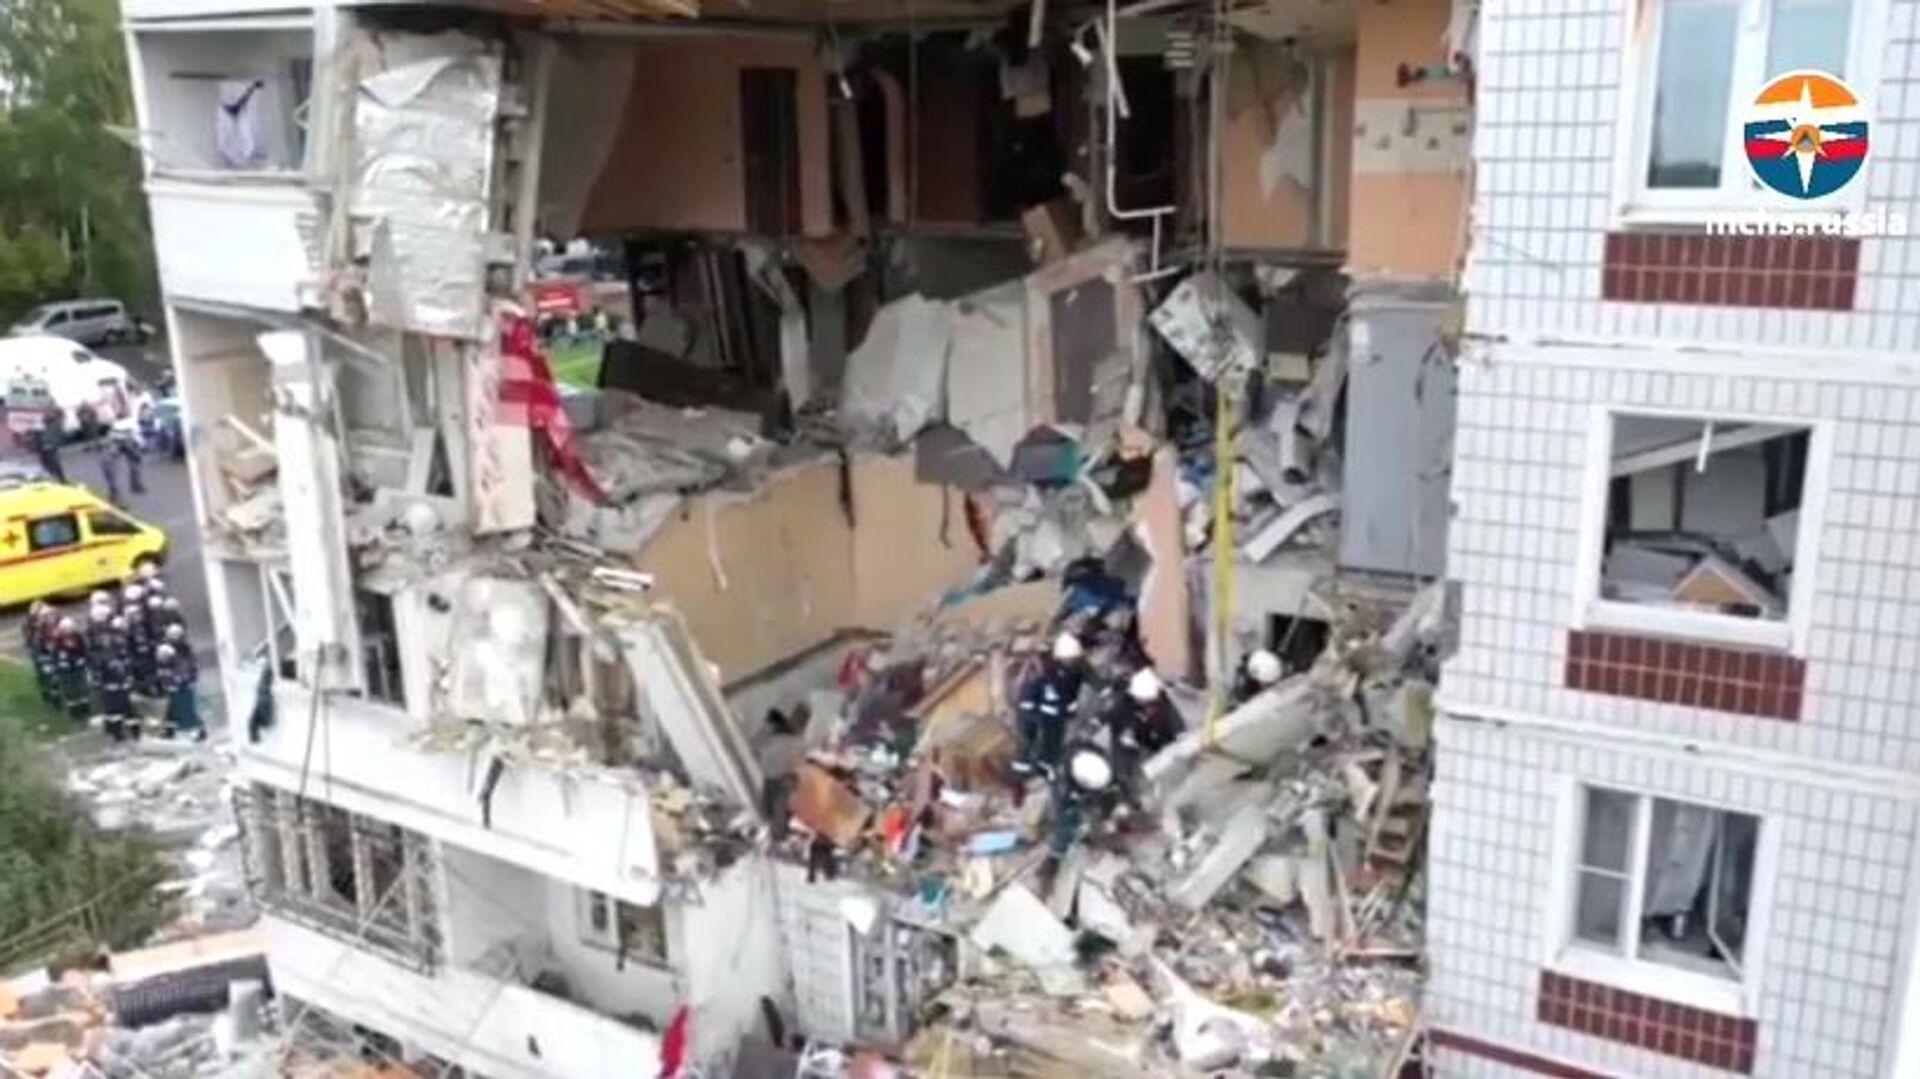 Gasexplosion zerstört Mehrfamilienhaus in Noginsk, Russland - SNA, 1920, 08.09.2021